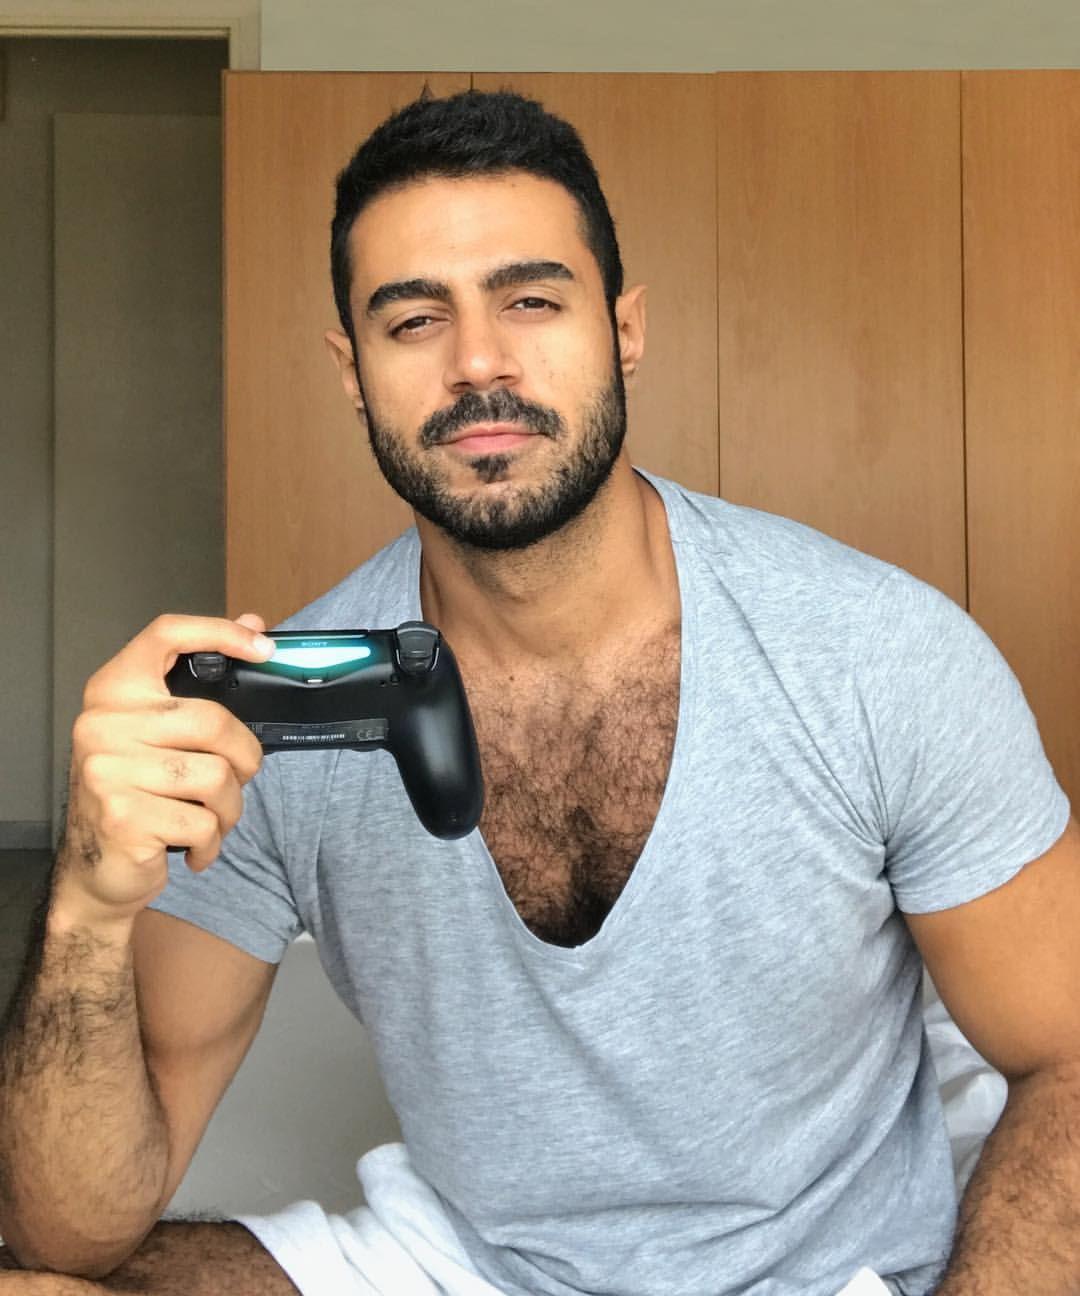 Ready Player One Home Gamer Videogames Beard